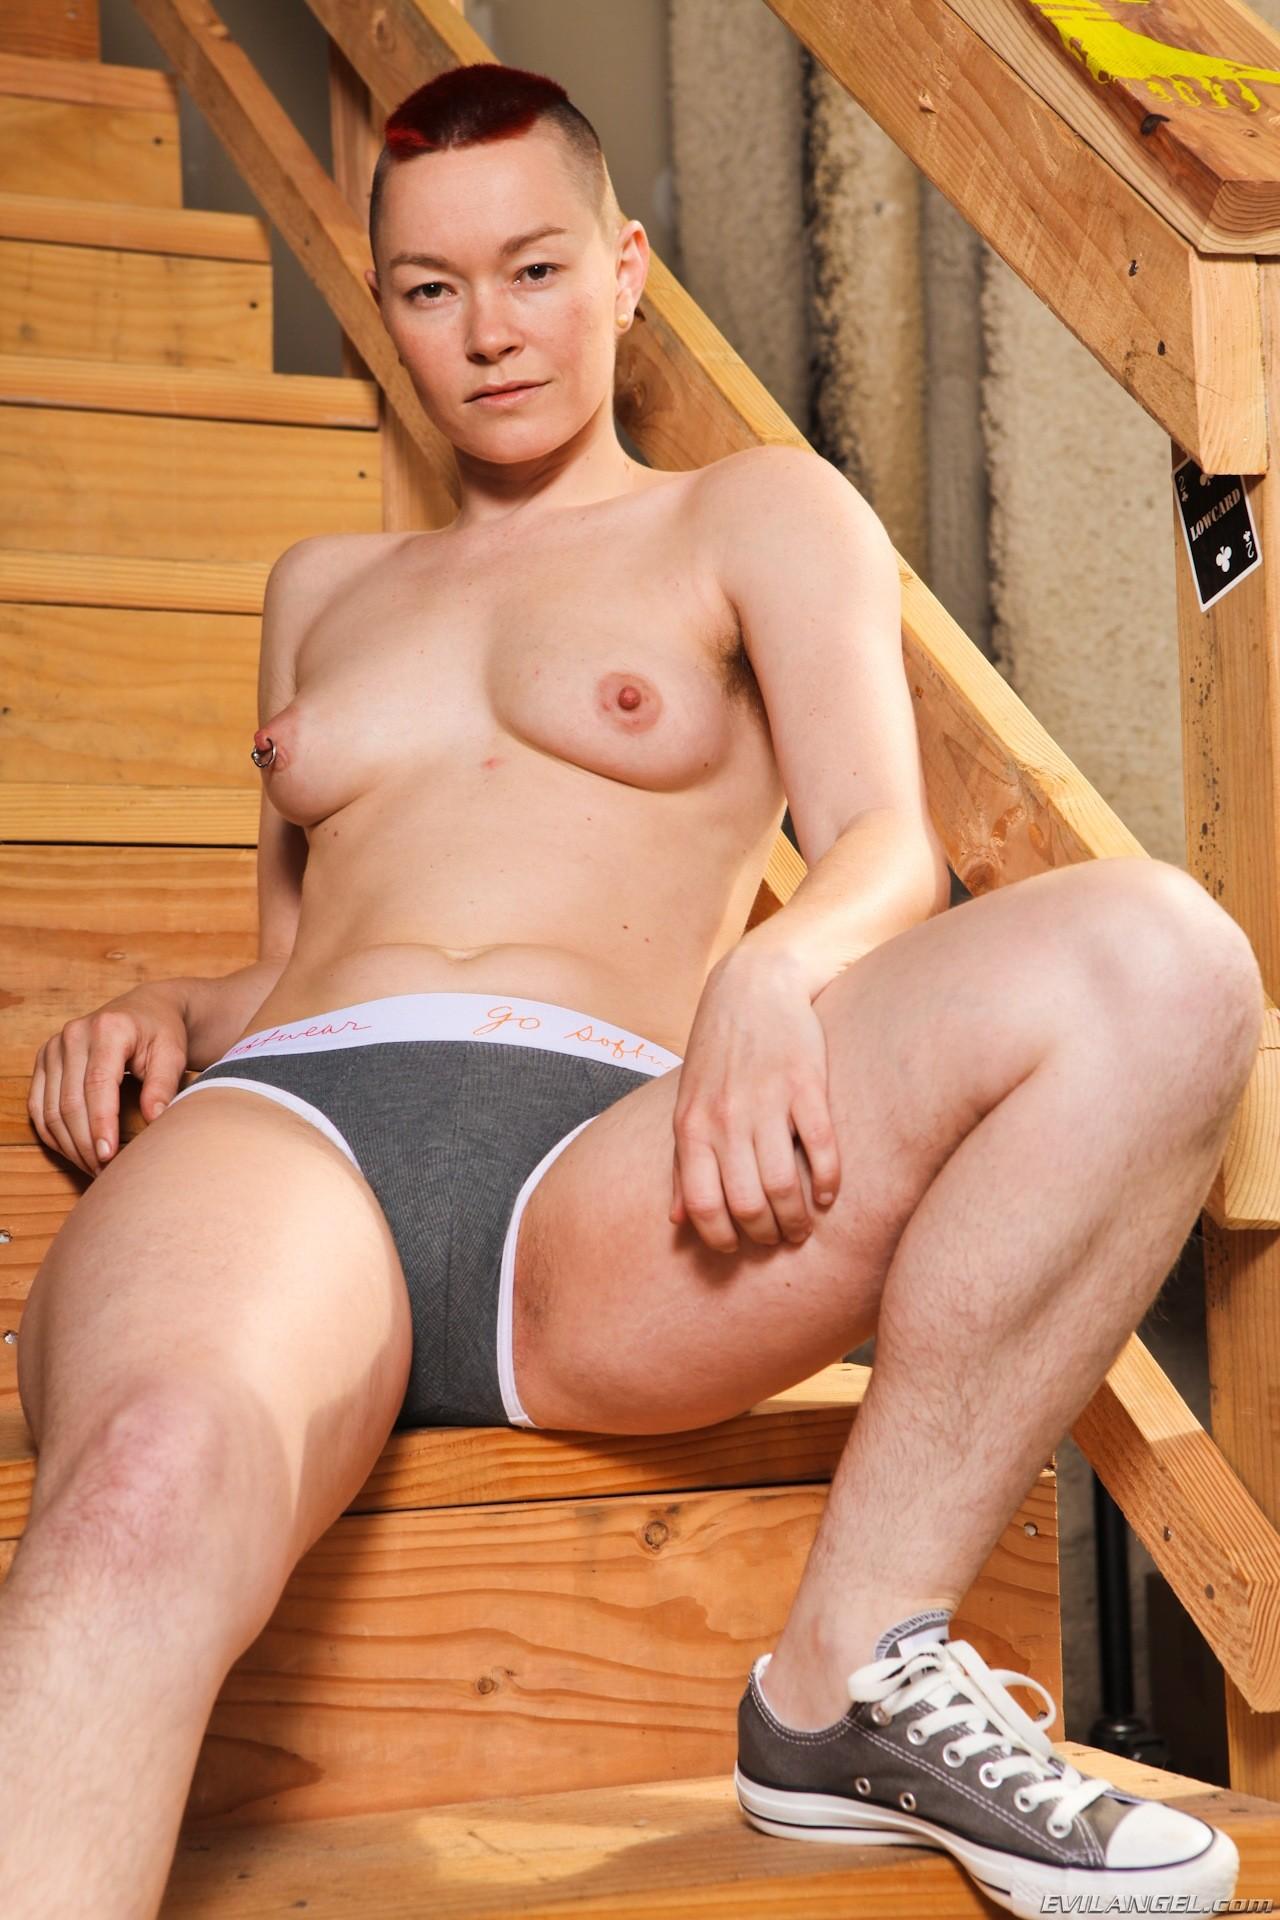 Bobbi Starr - Vicarious 73234